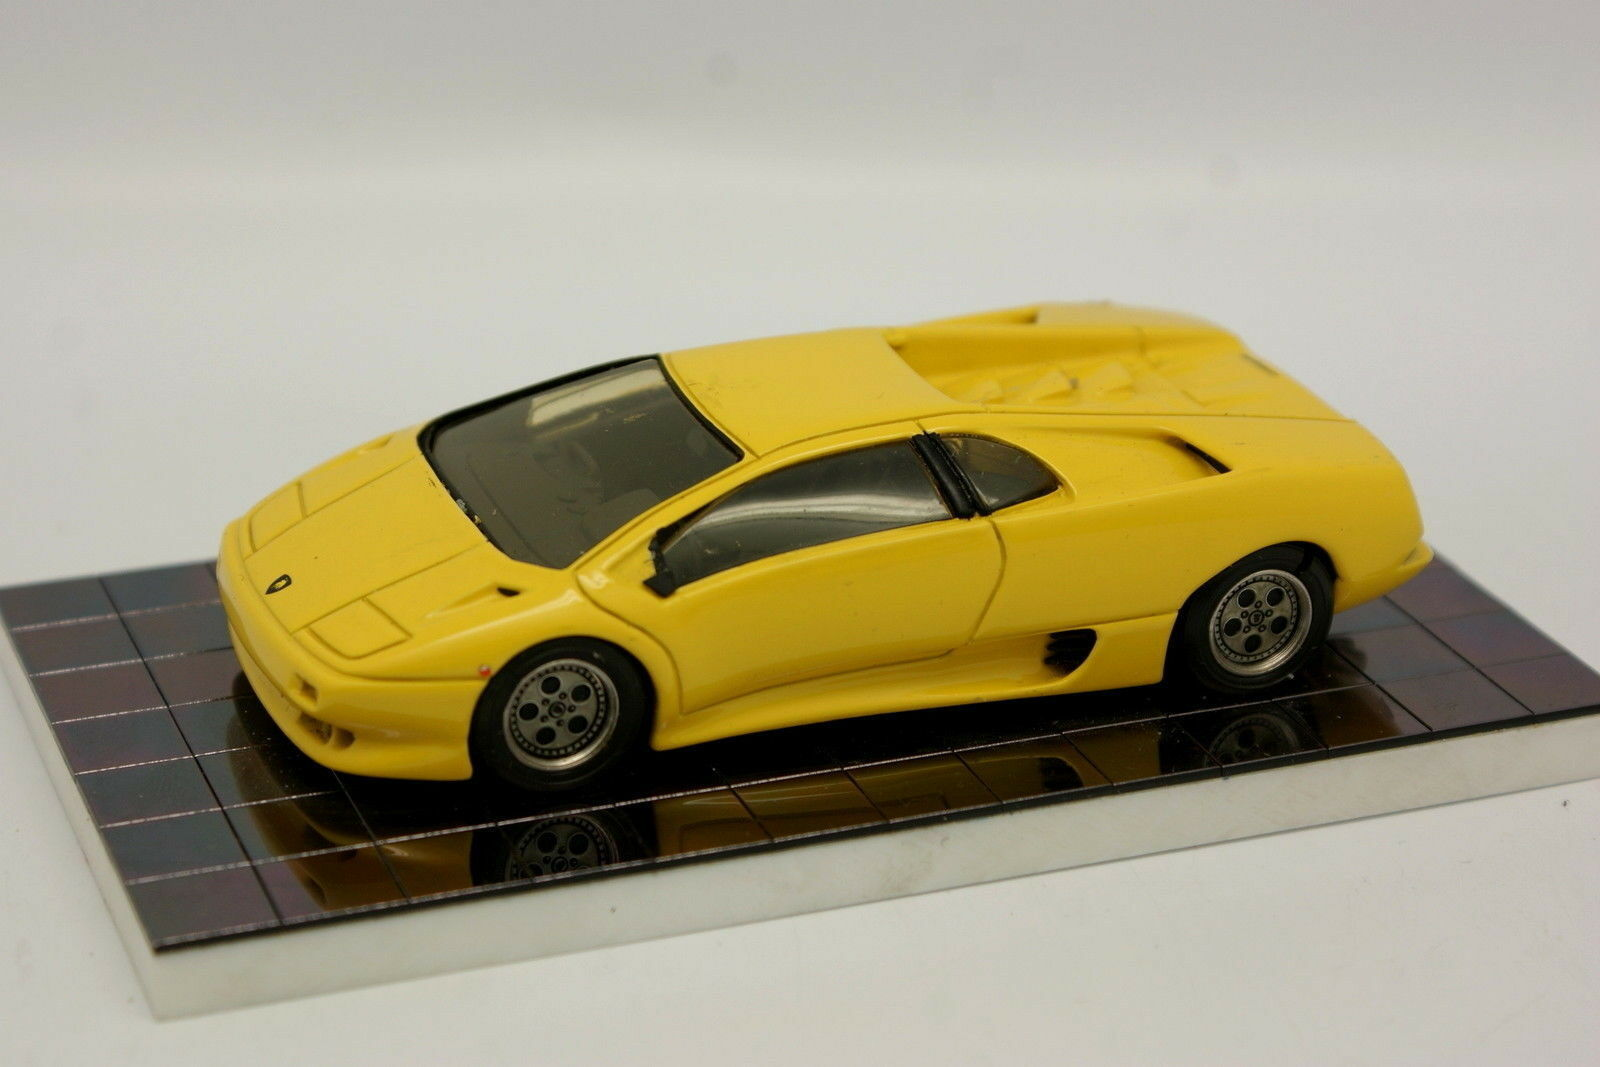 Heco Heco Heco Modelli kit montato 1 43 - Lamborghini Diablo Gialla c86082